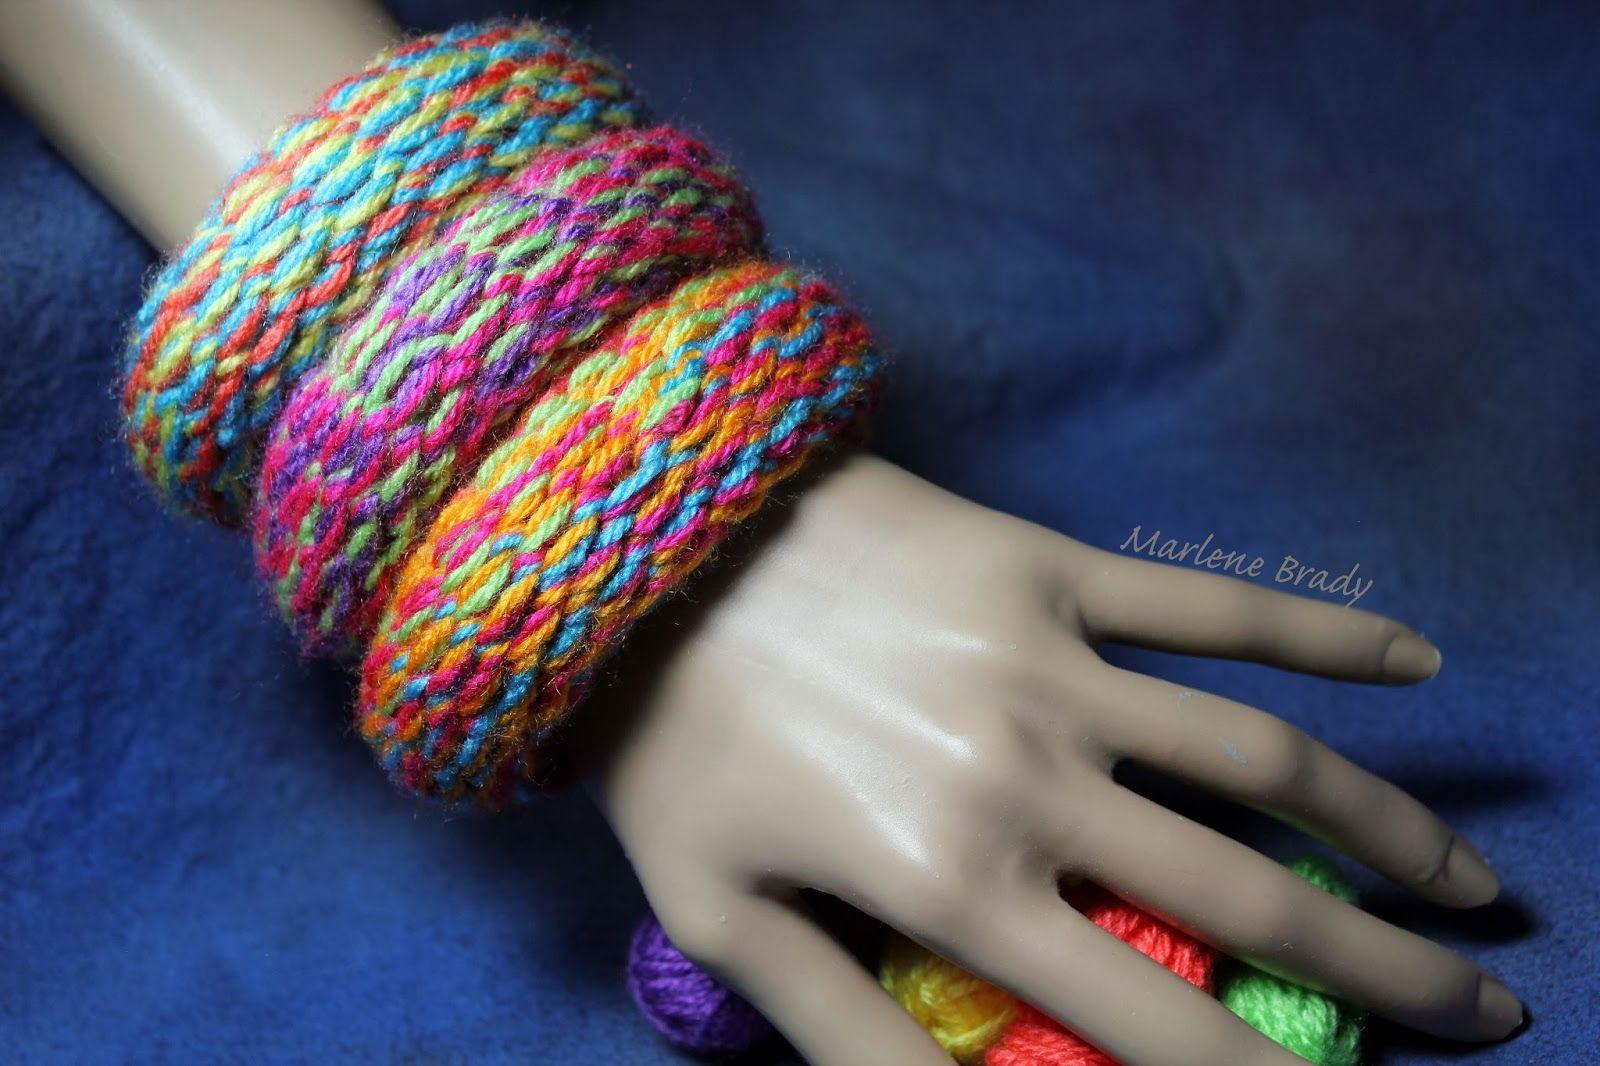 Made by Marlene Brady. Bangles made on a knitting loom ...